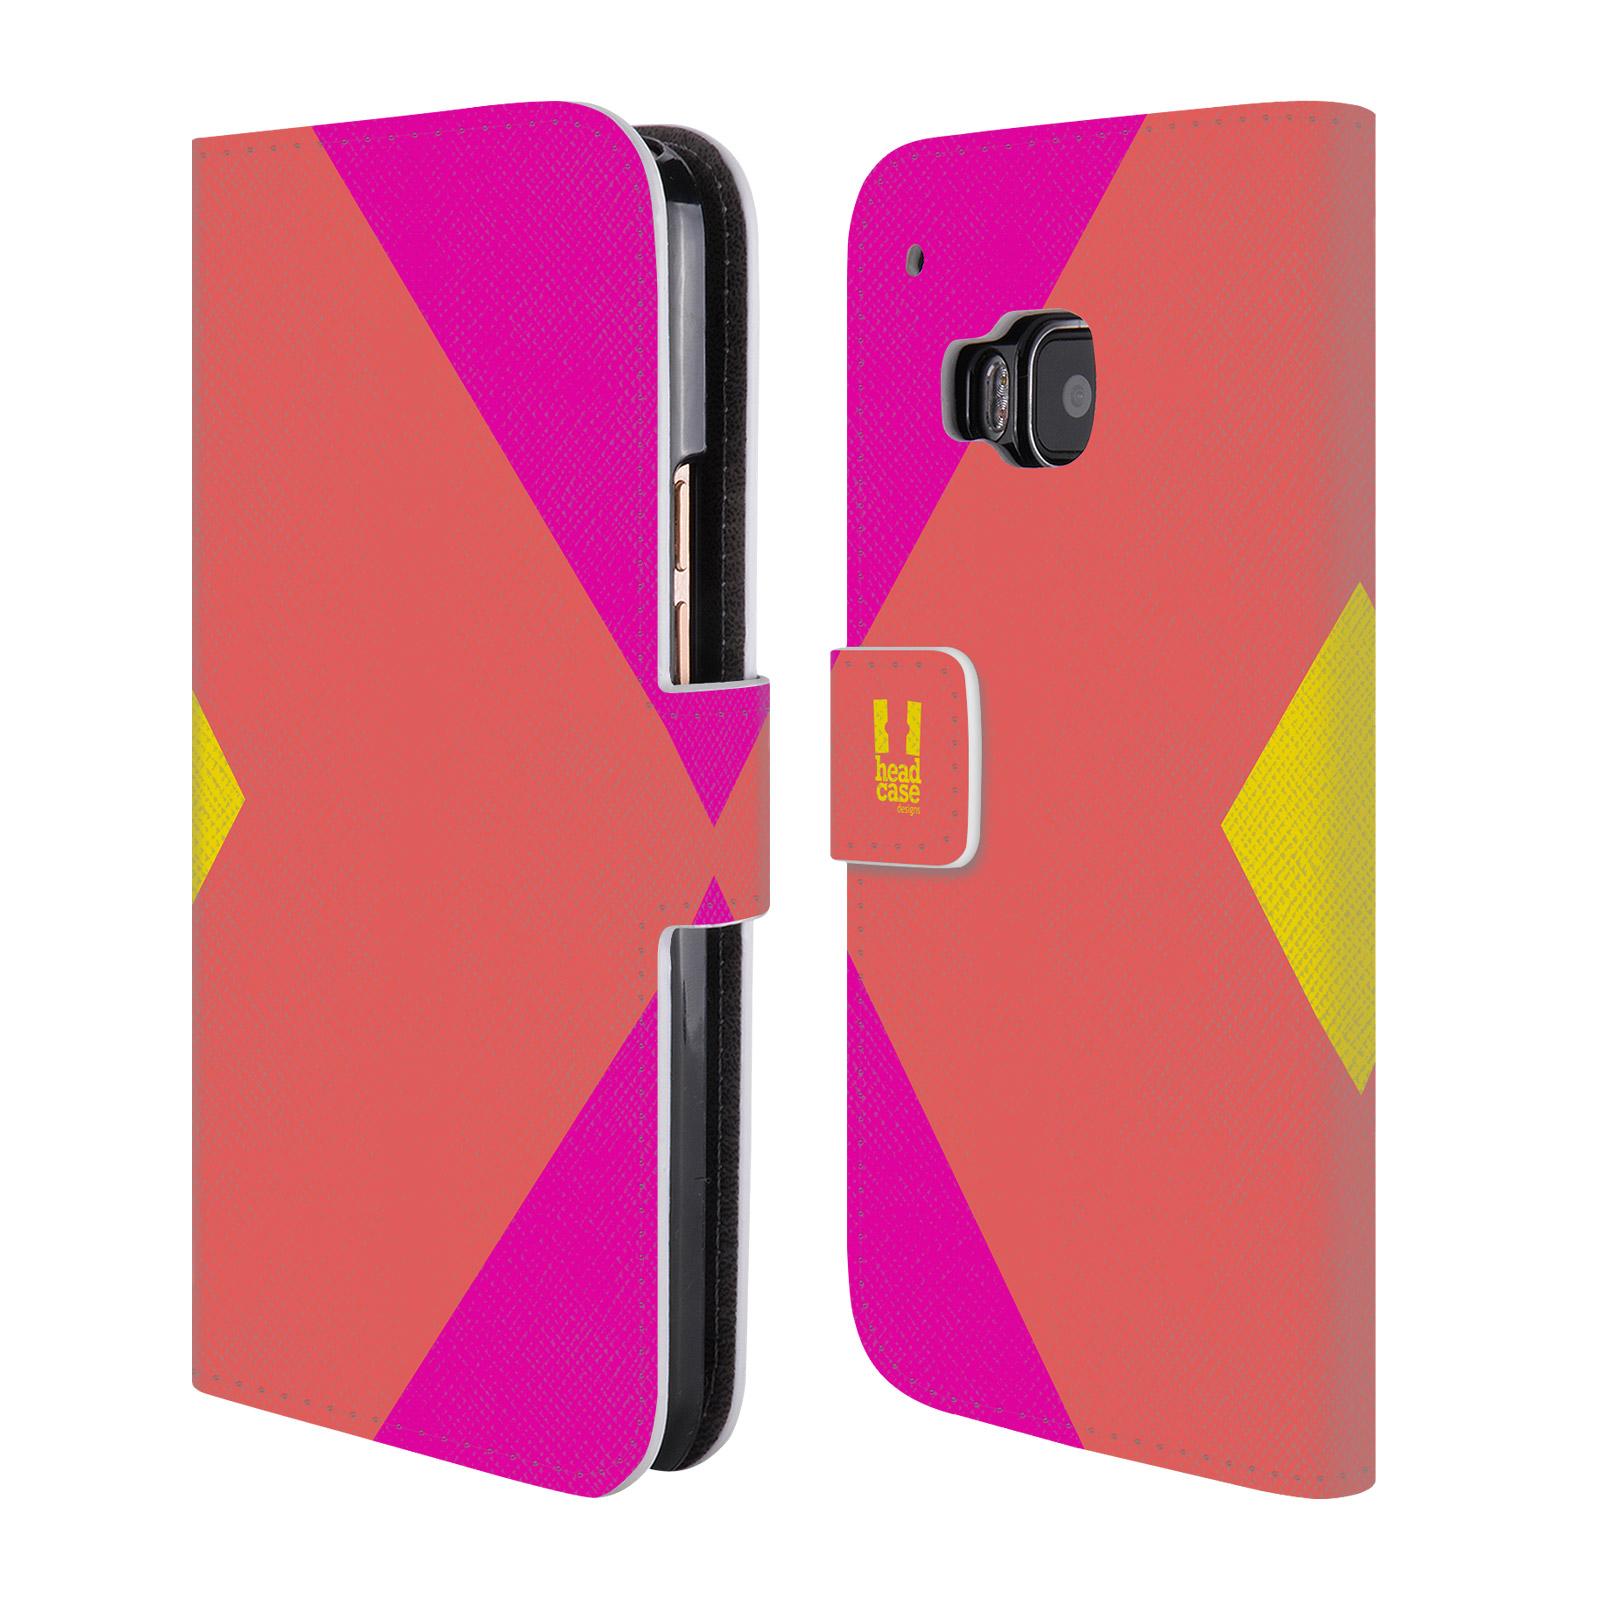 HEAD CASE Flipové pouzdro pro mobil HTC ONE M9 barevné tvary růžová korál